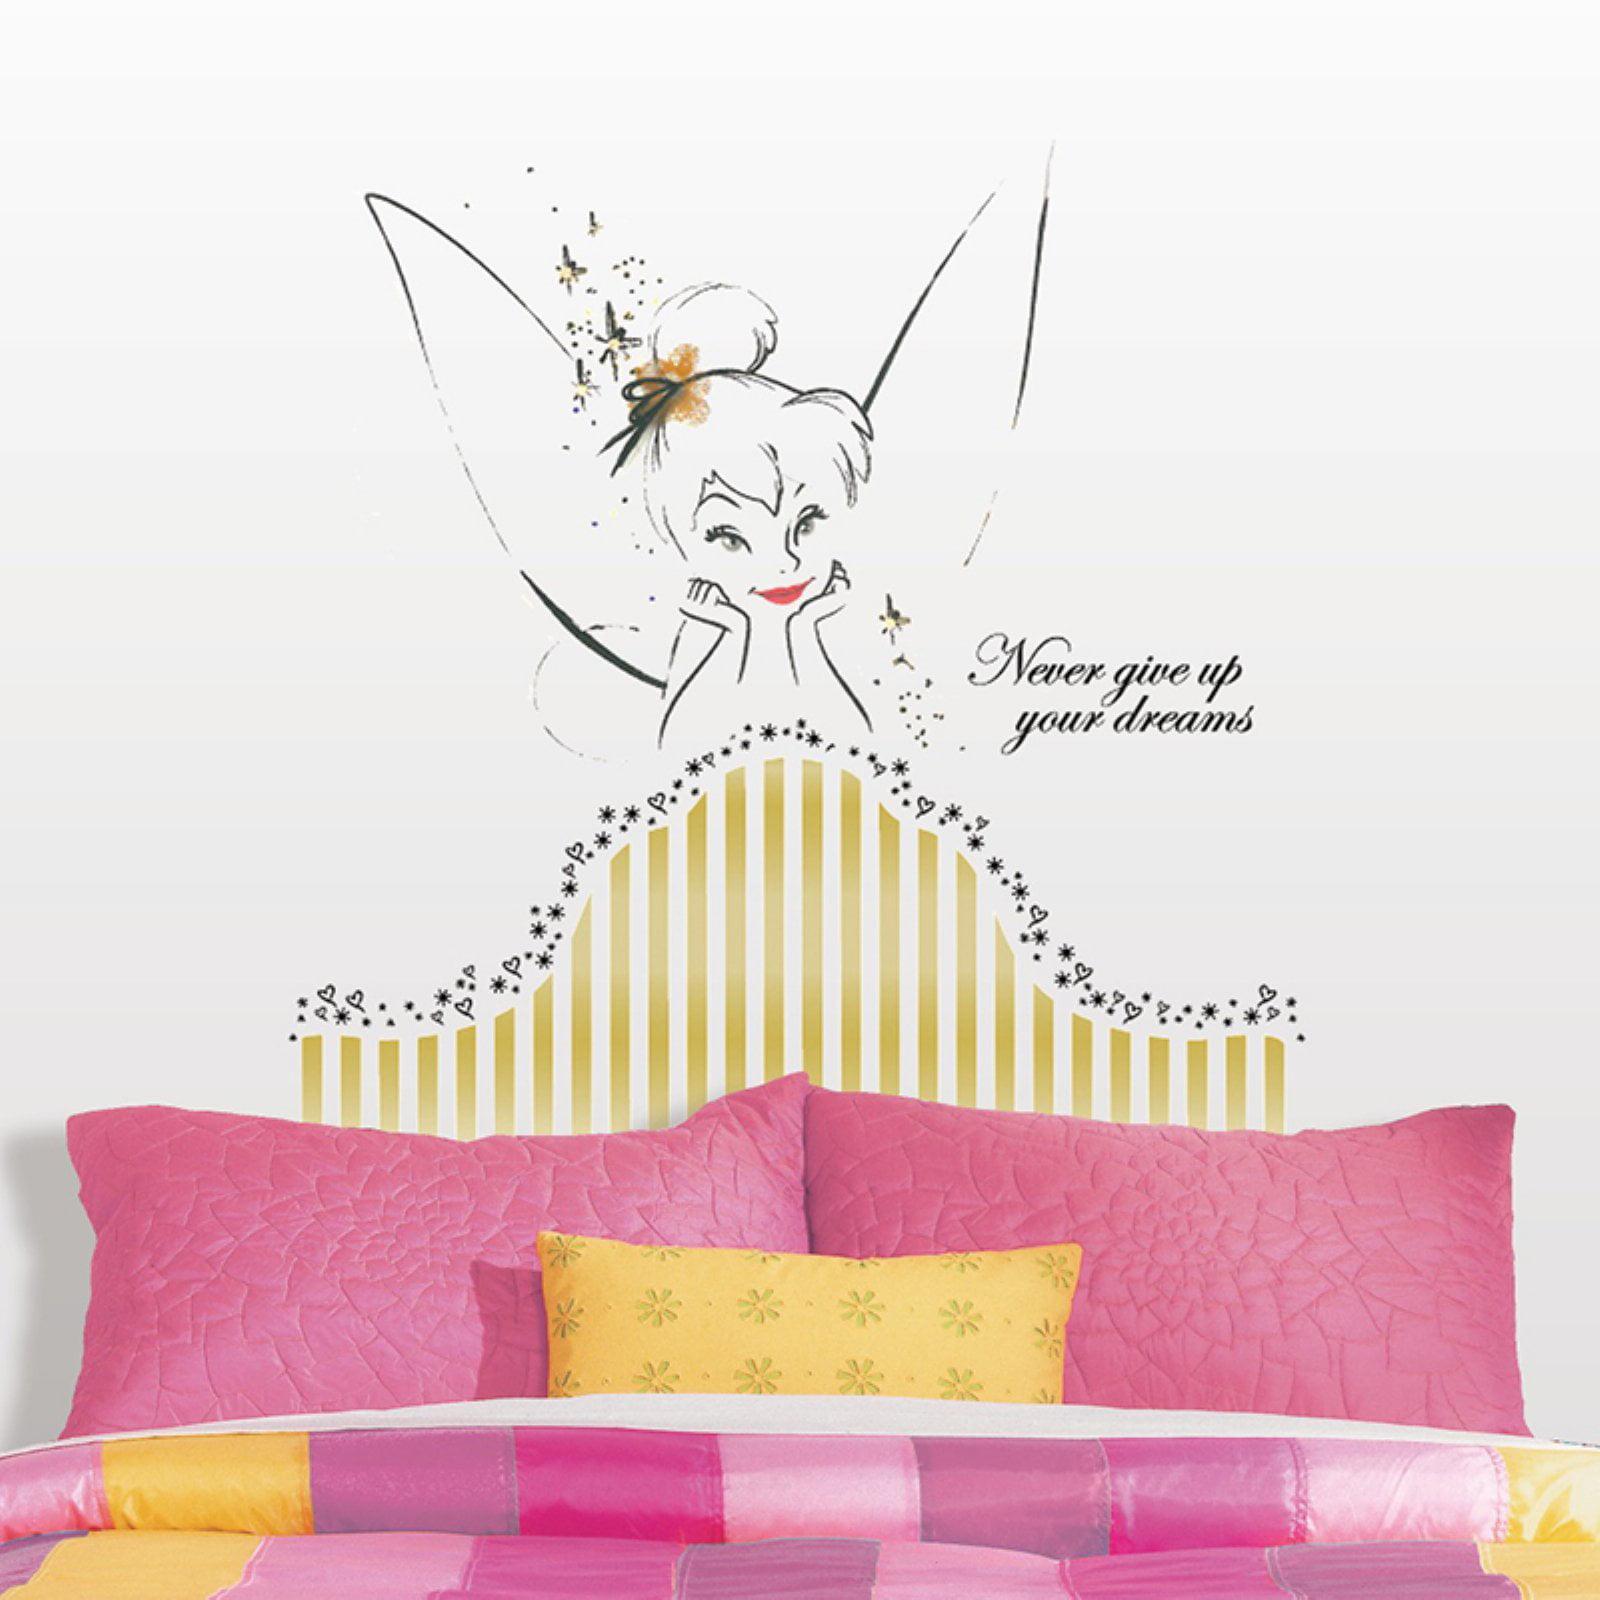 Disney Fairies Tinkerbell Headboard Peel & Stick Giant Wall Decal